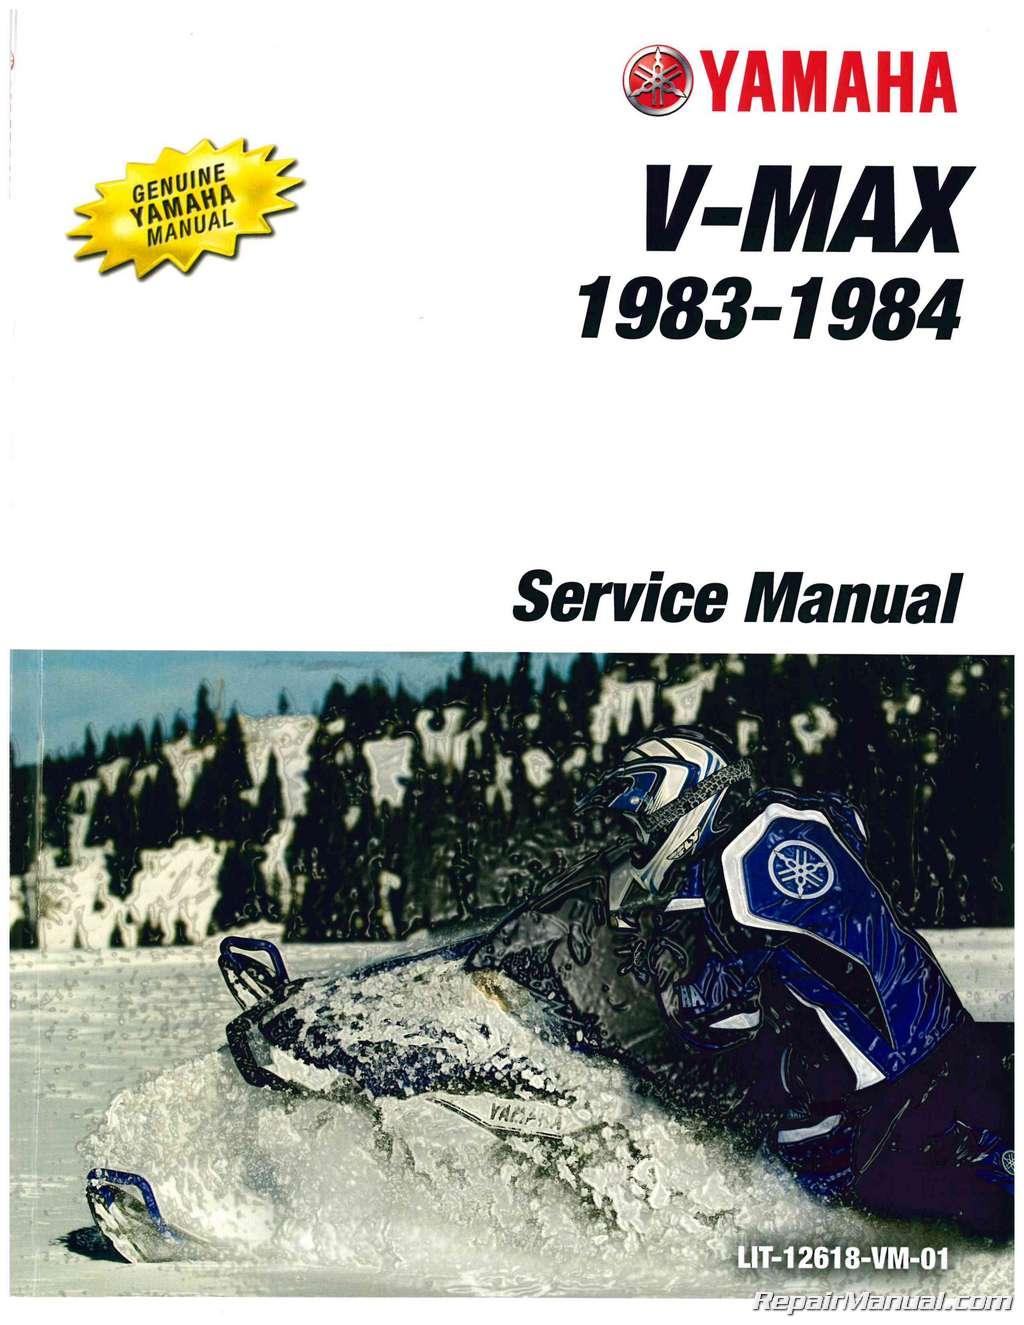 Honda Factory Performance >> 1983-1984 Yamaha VMAX VMX540 Snowmobile Service Manual